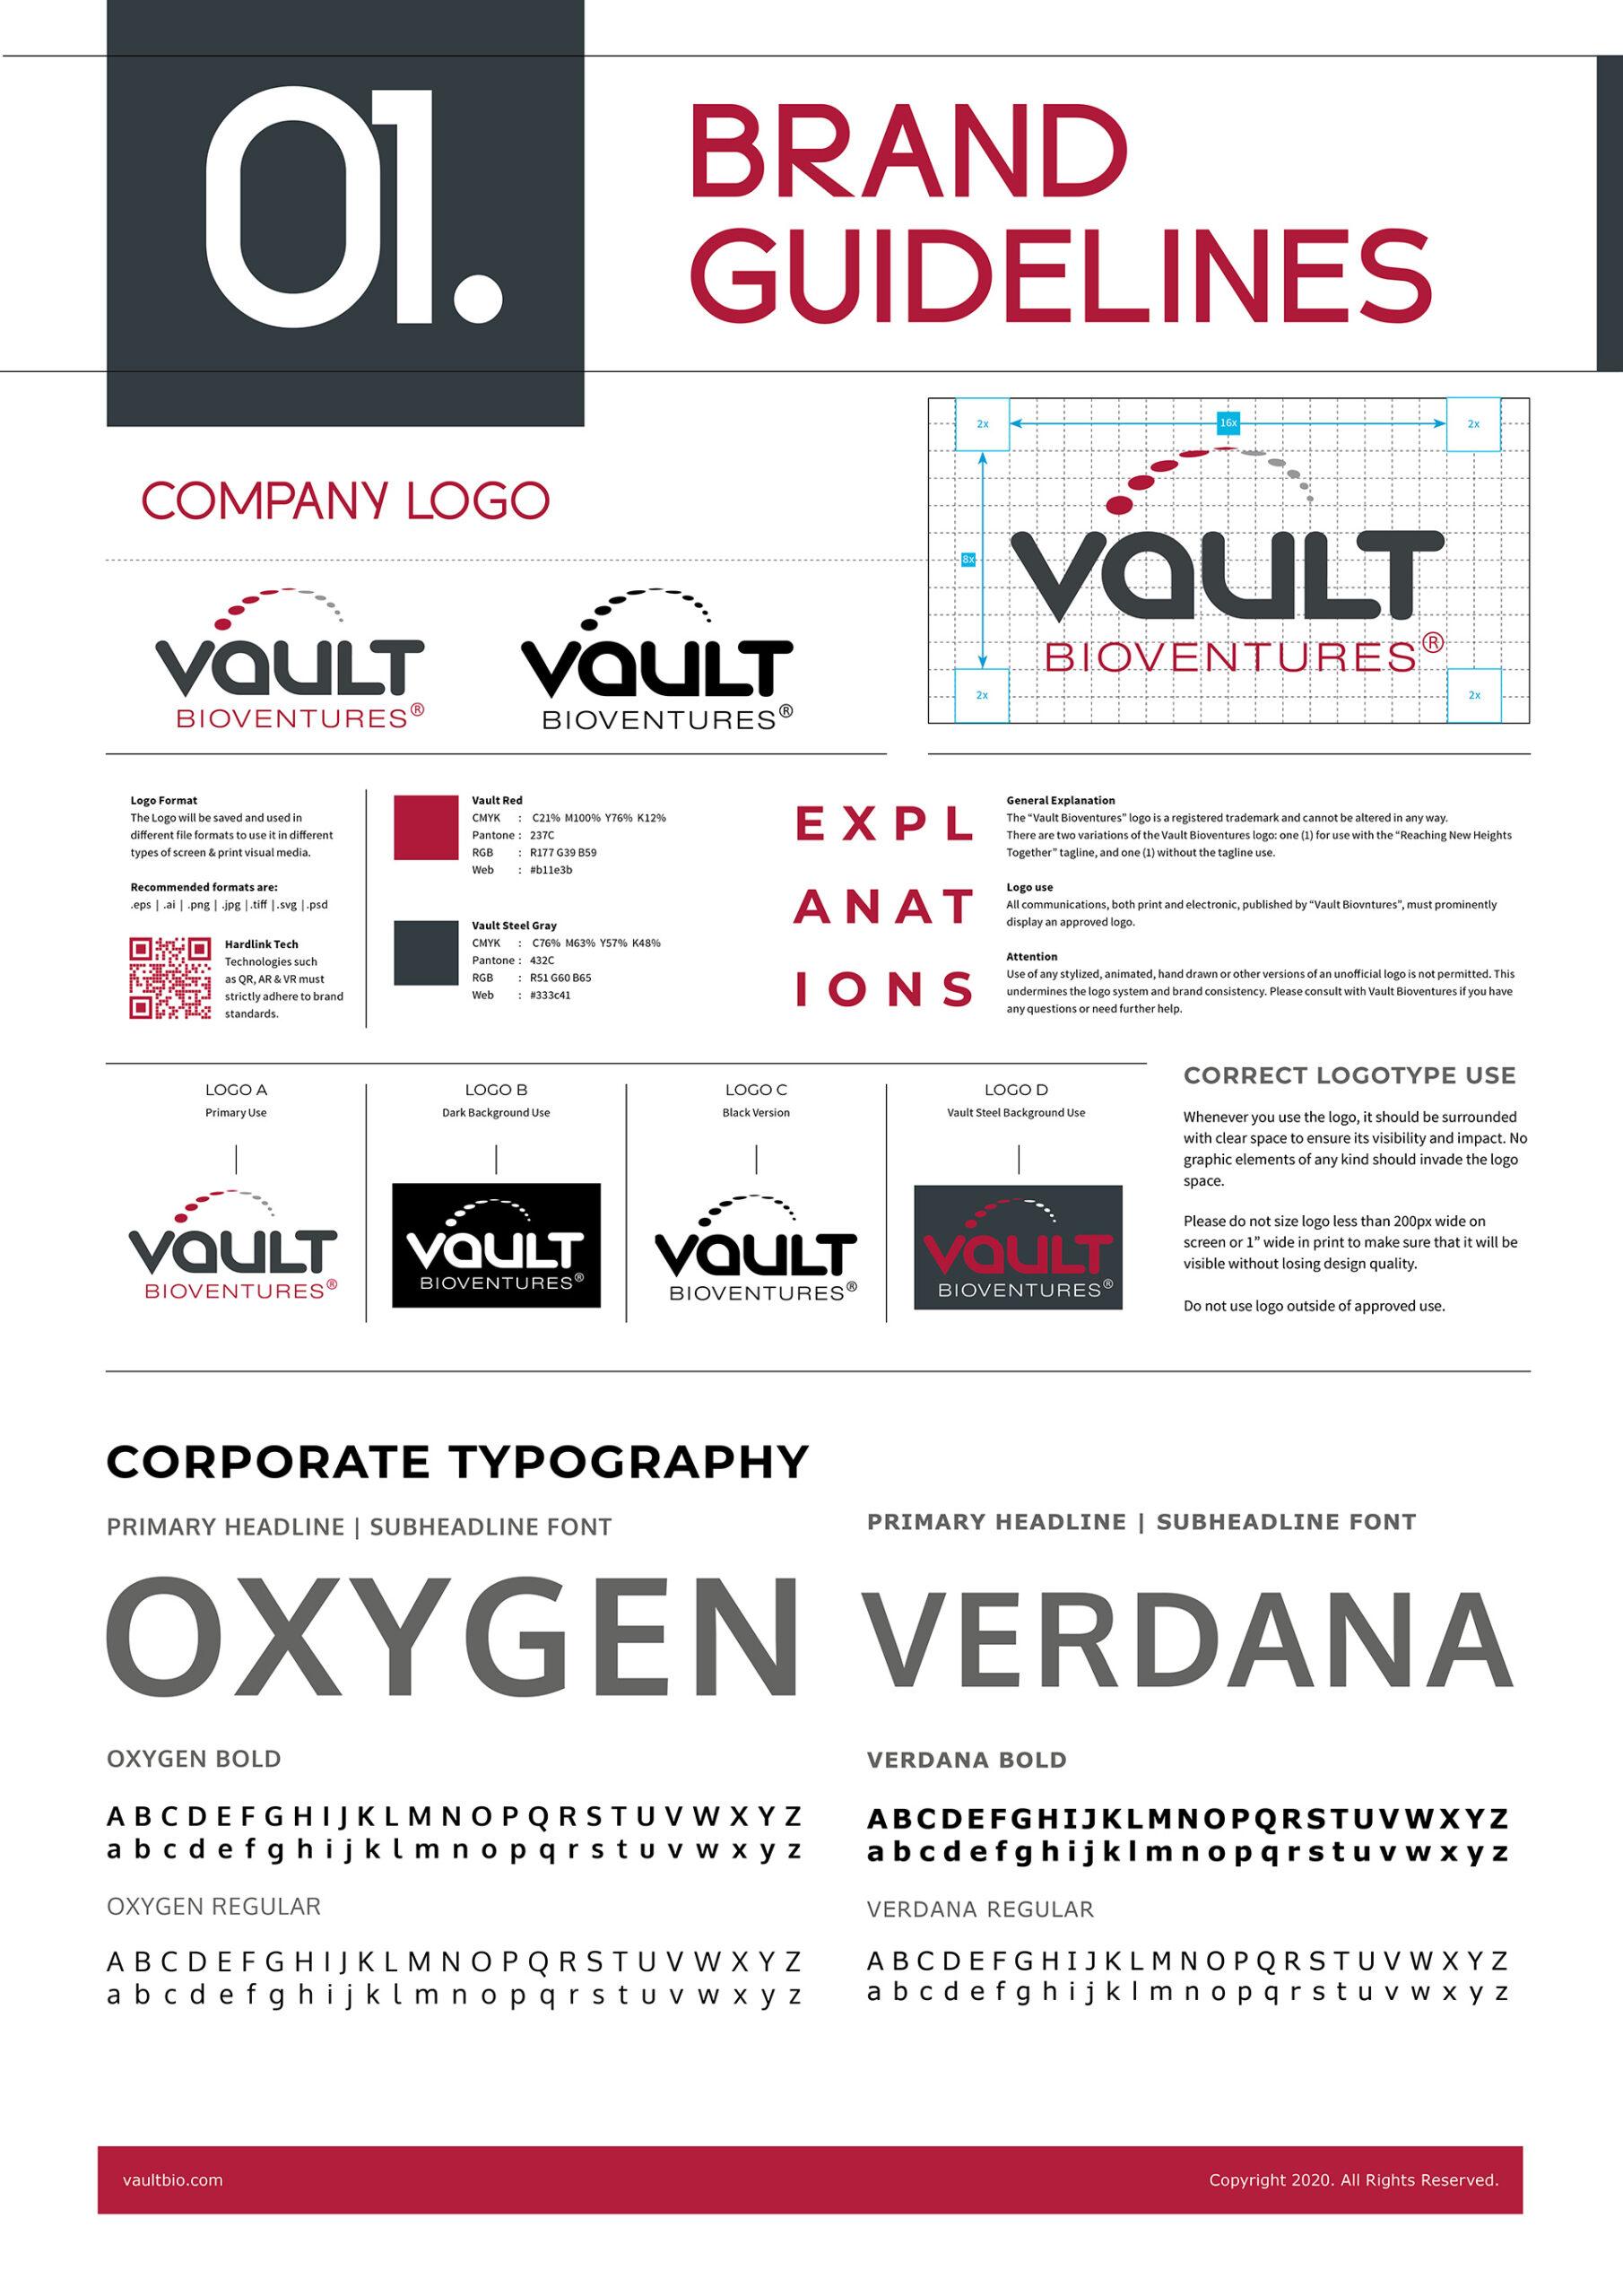 san diego brand manual logo design guidelines vault bioventures